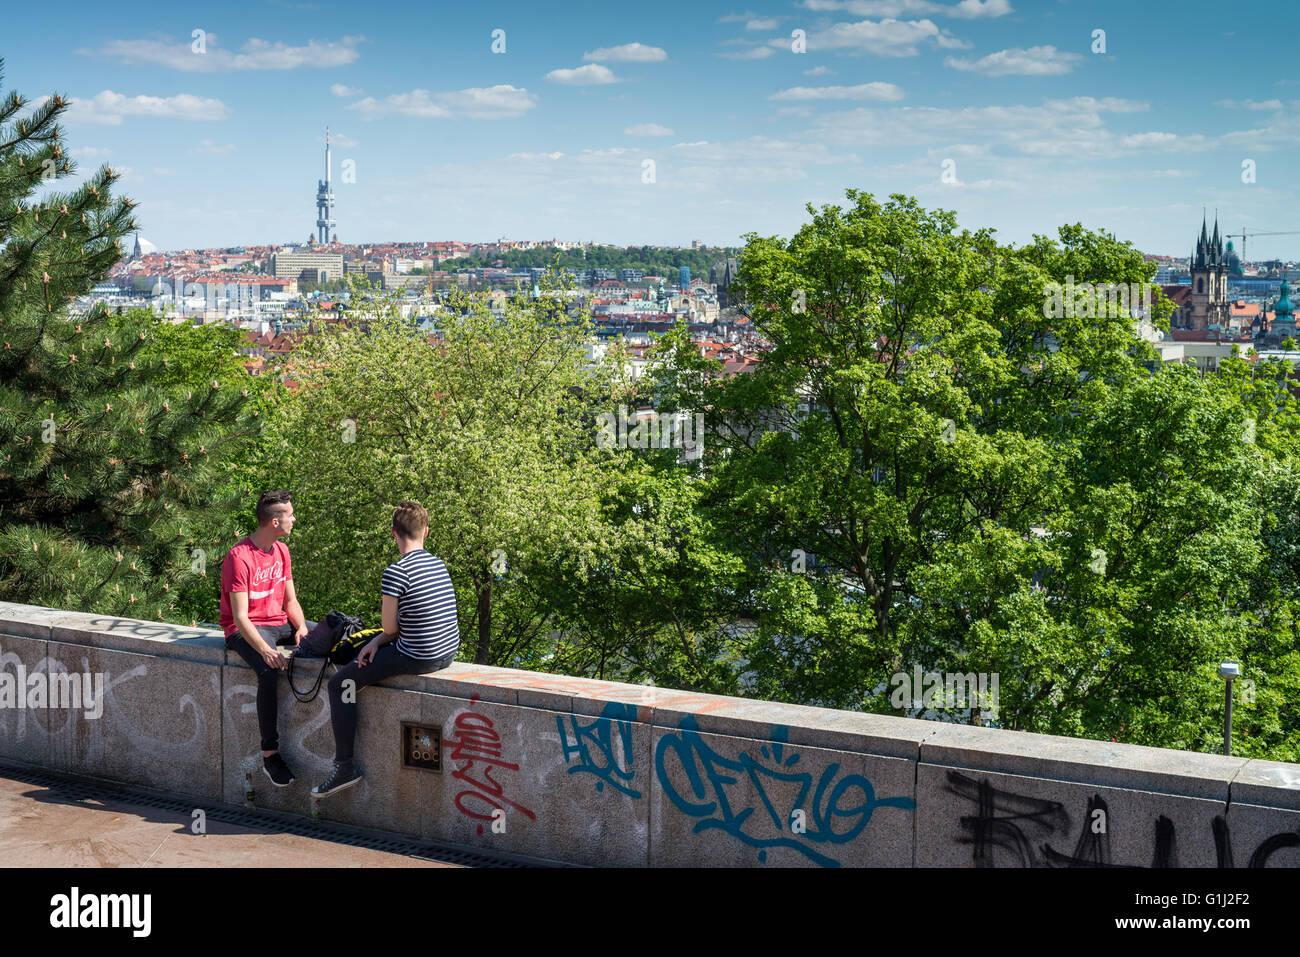 The Metronome and Letna park, Prague, Czech Republic, Europe - Stock Image